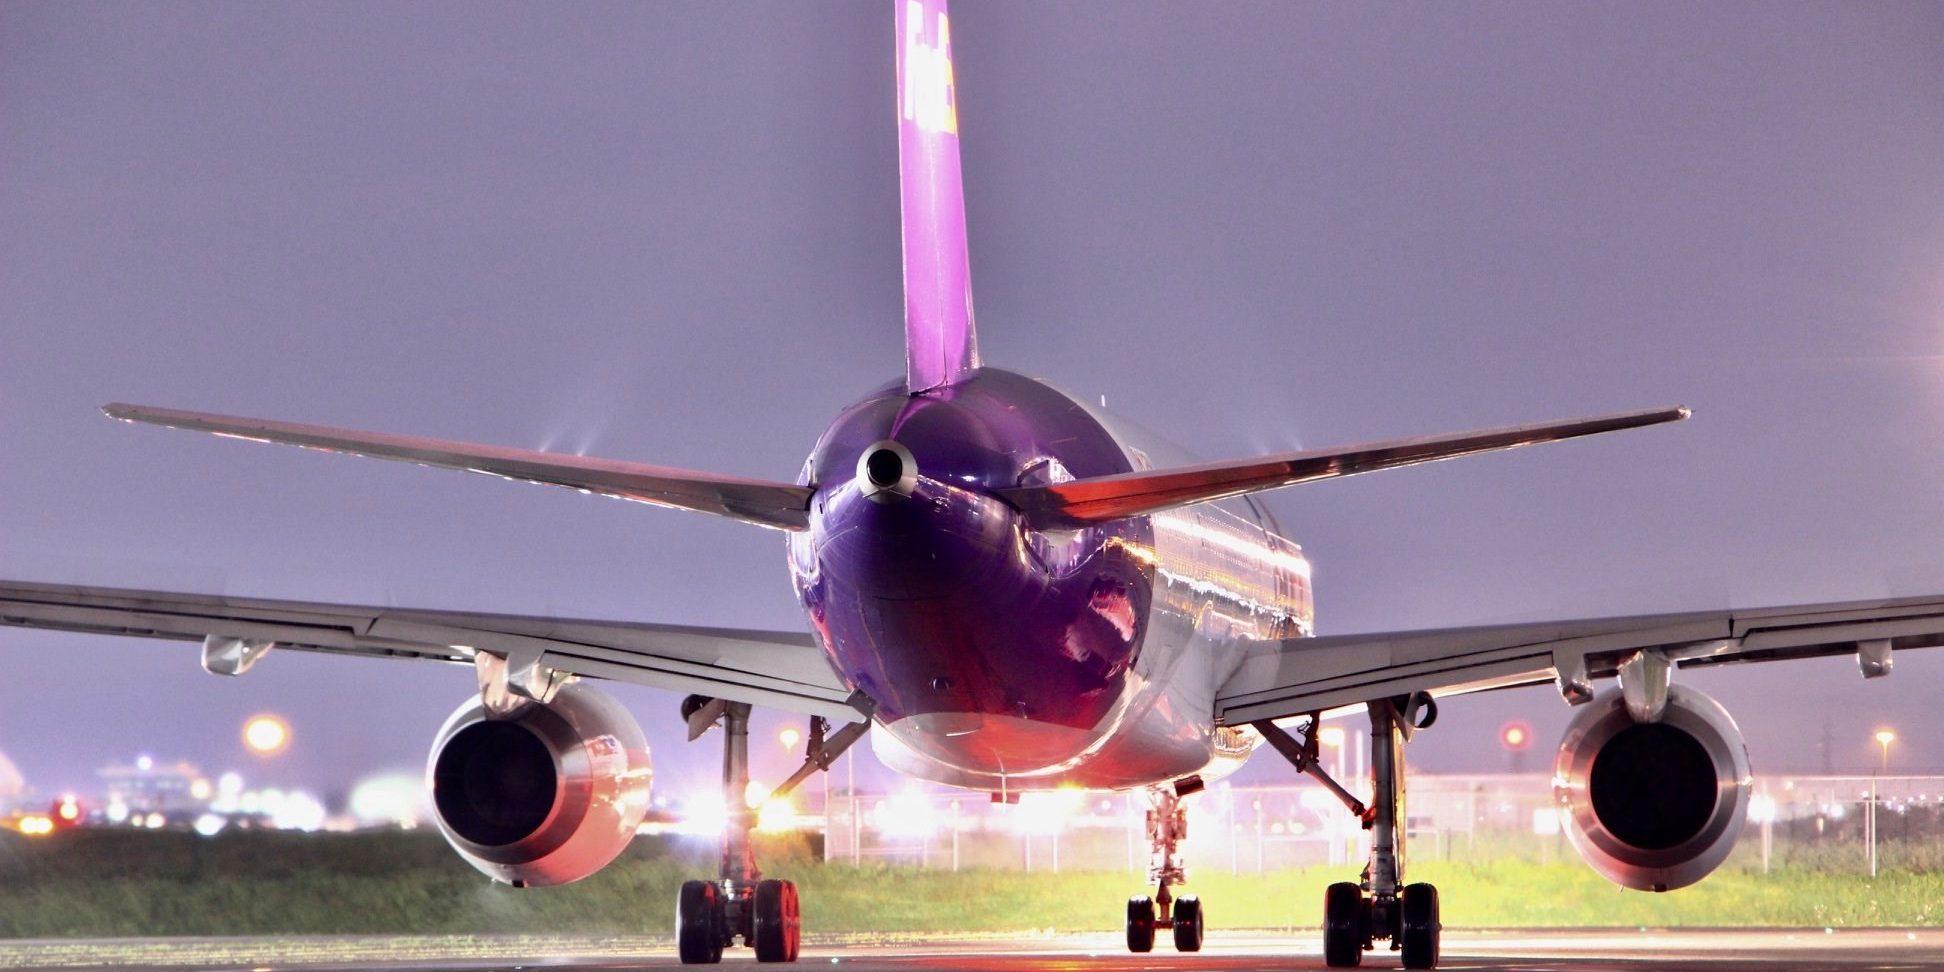 plane taxi - 2